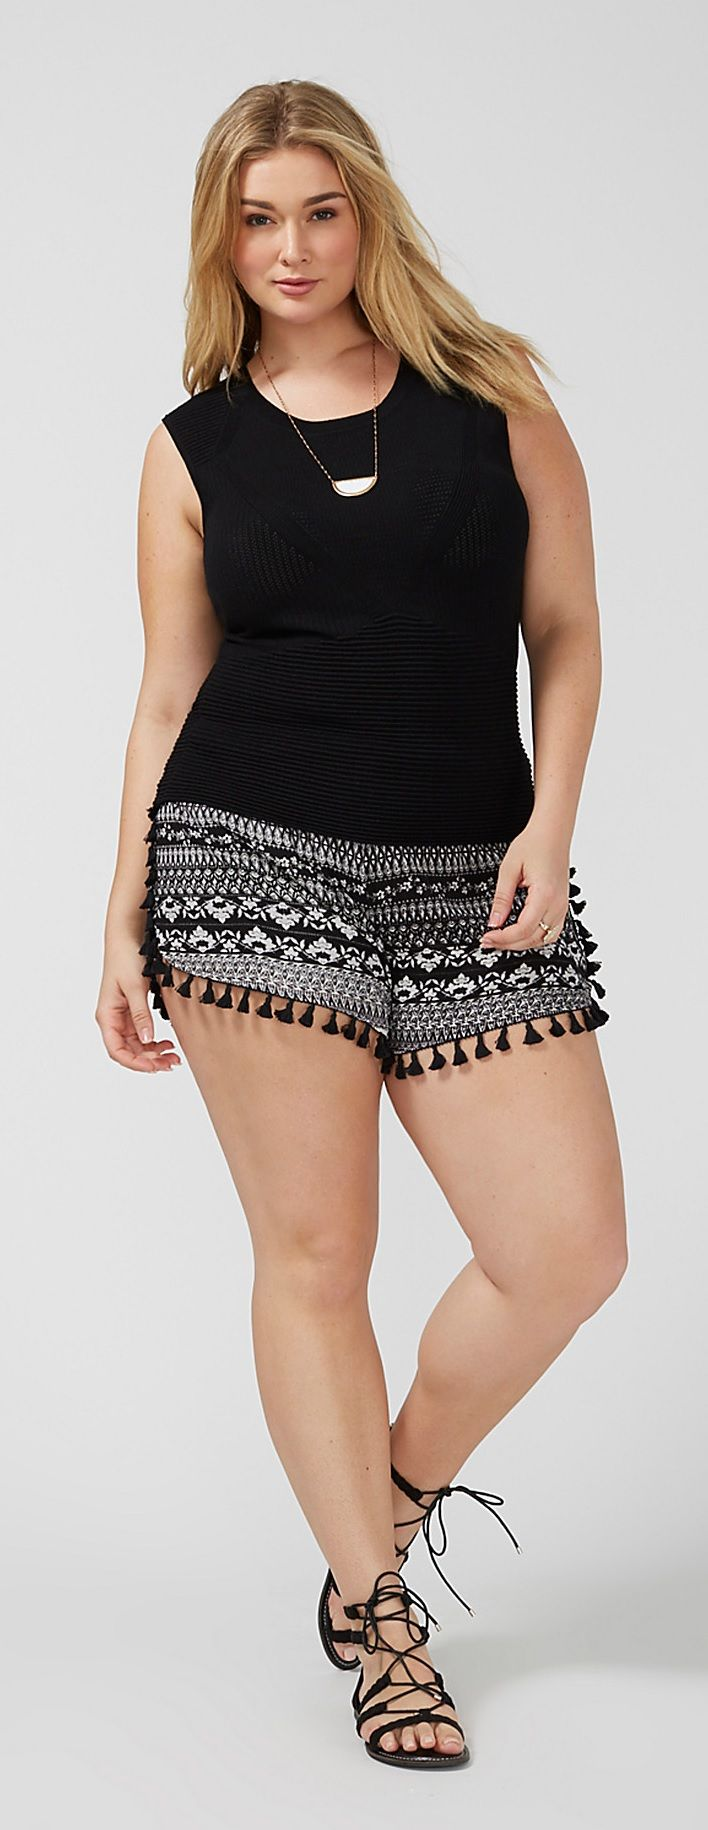 plus size shorts with tassels plus size fashion. Black Bedroom Furniture Sets. Home Design Ideas